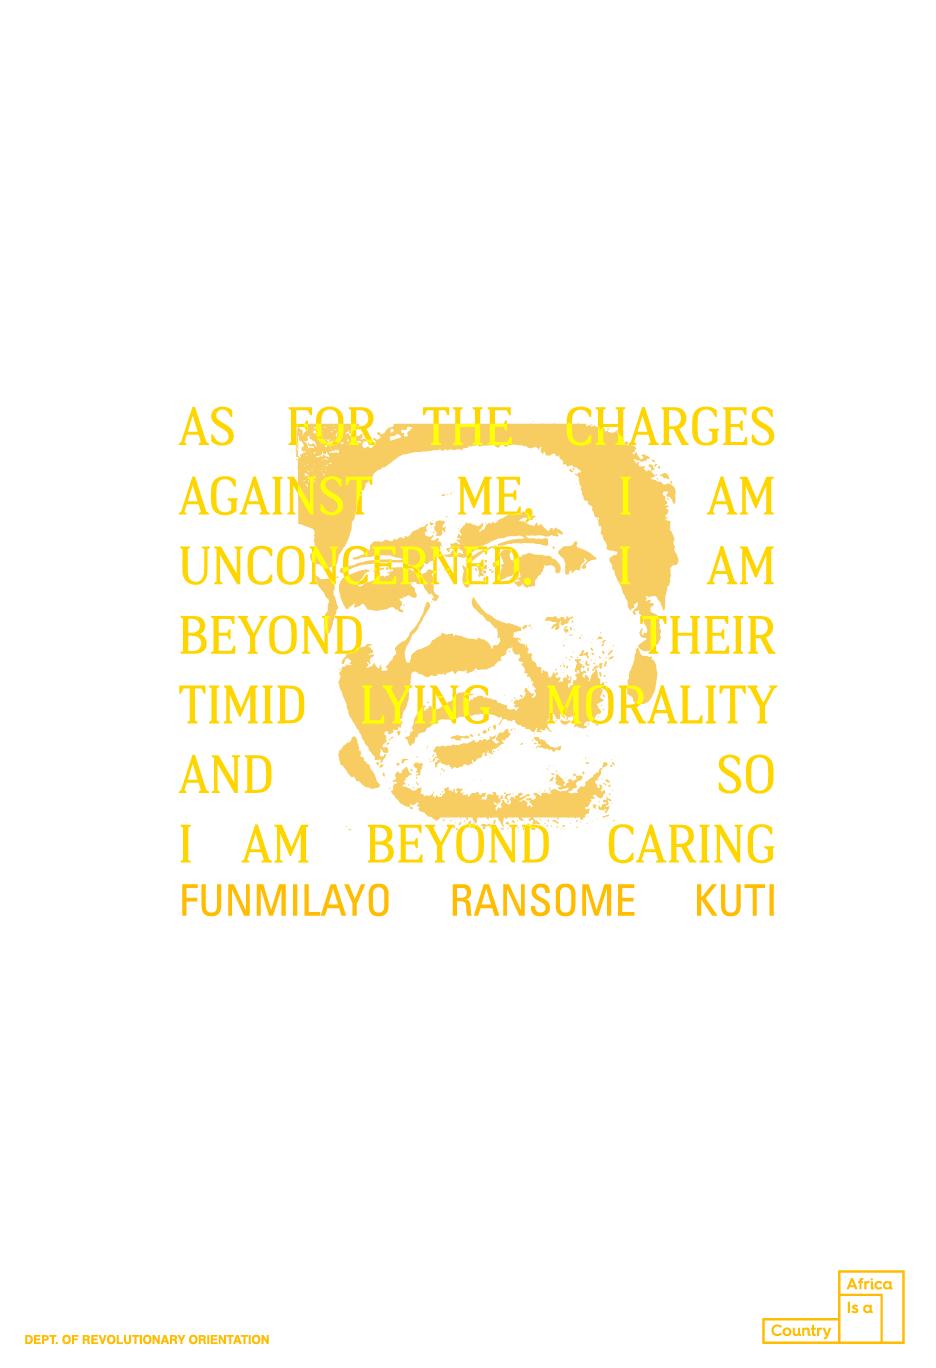 Funmilayo Ransome Kuti Poster